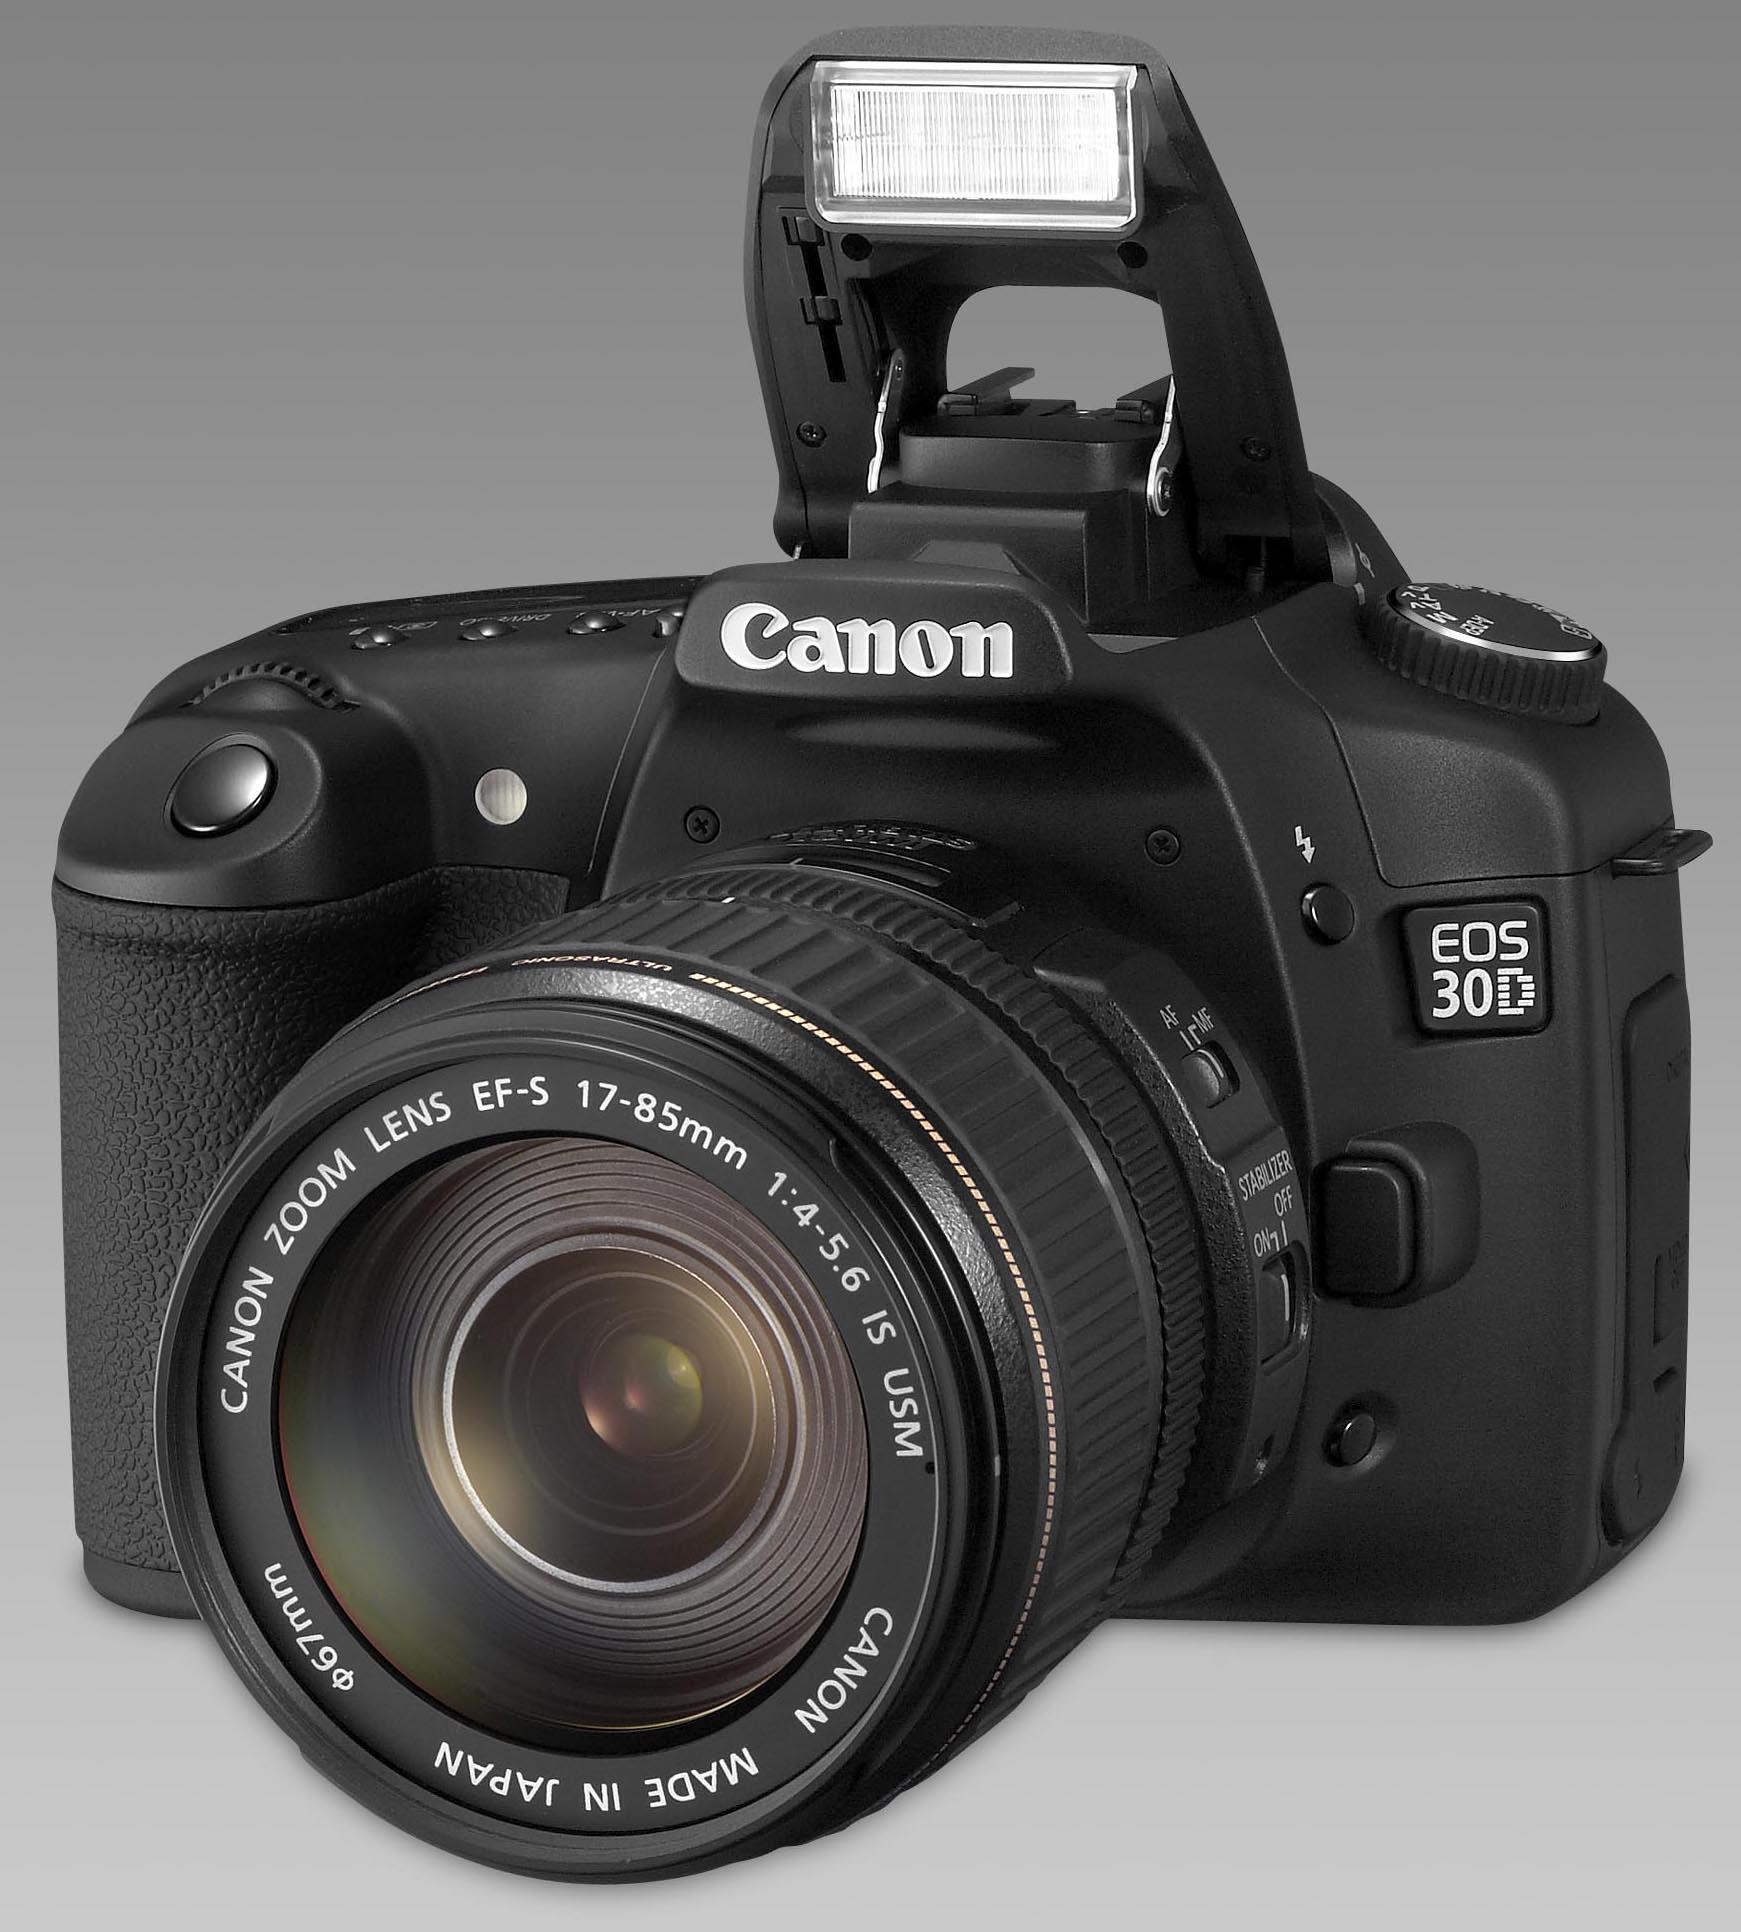 canon powershot g9 digital camera original user guide instruction manual genuine canon manual